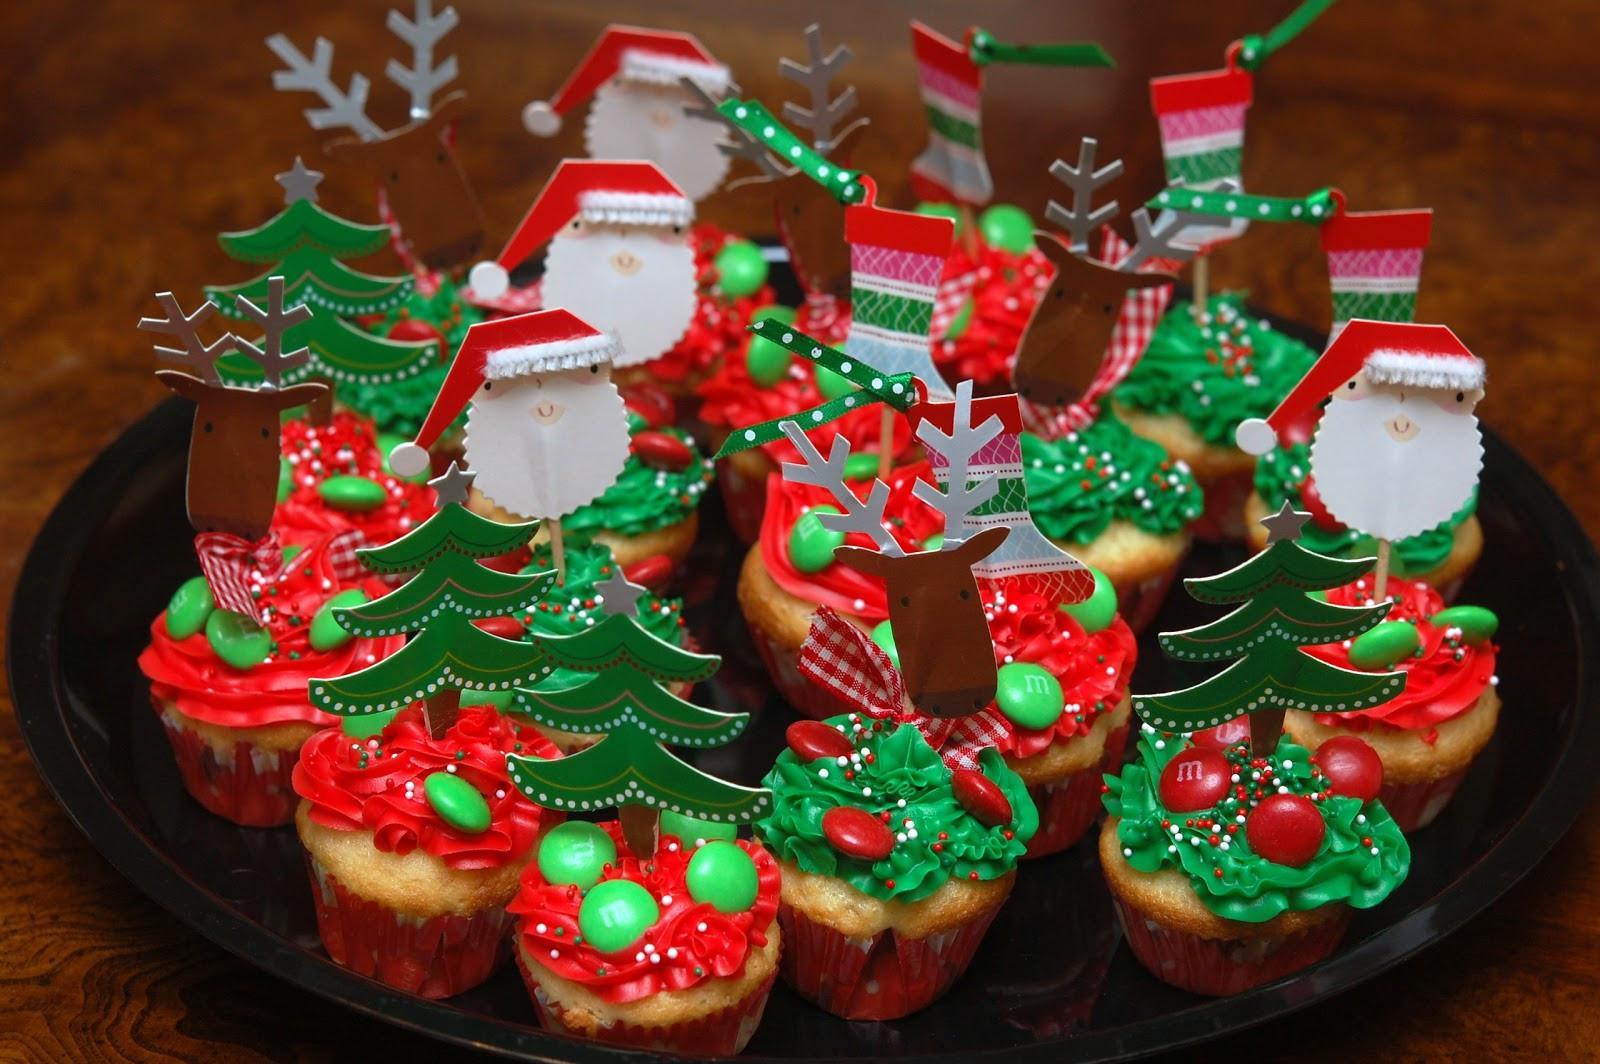 Mini Christmas Cupcakes  MINI HOLIDAY CUPCAKES Hugs and Cookies XOXO